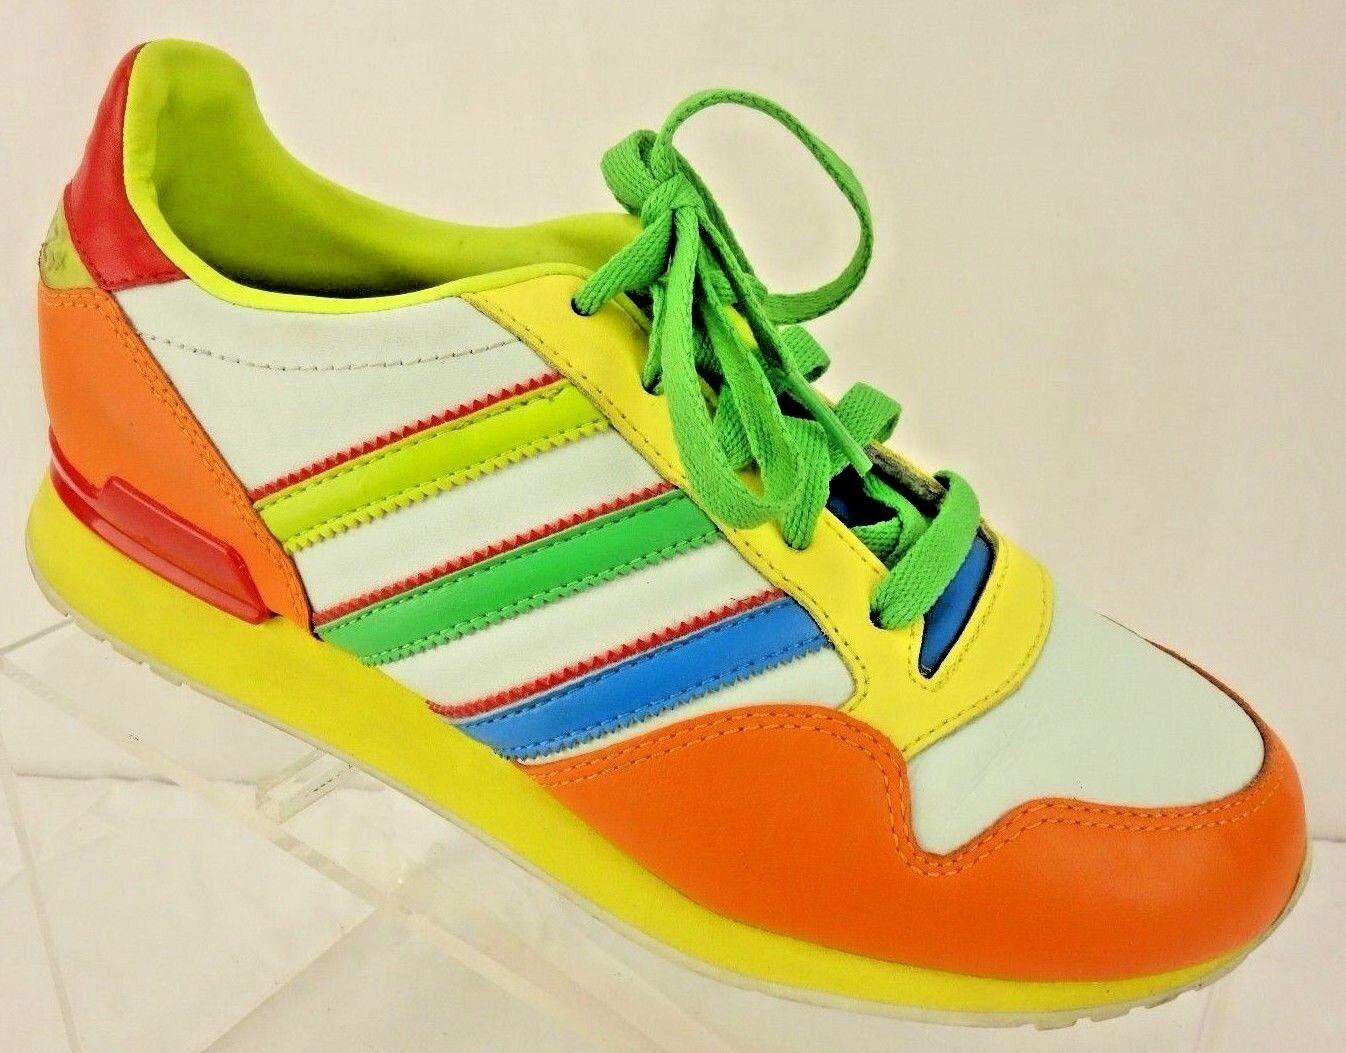 ADIDAS ZXZ+ Multi Color Leather Stripe Sneaker Athletic Shoe Men's 4.5 Medium